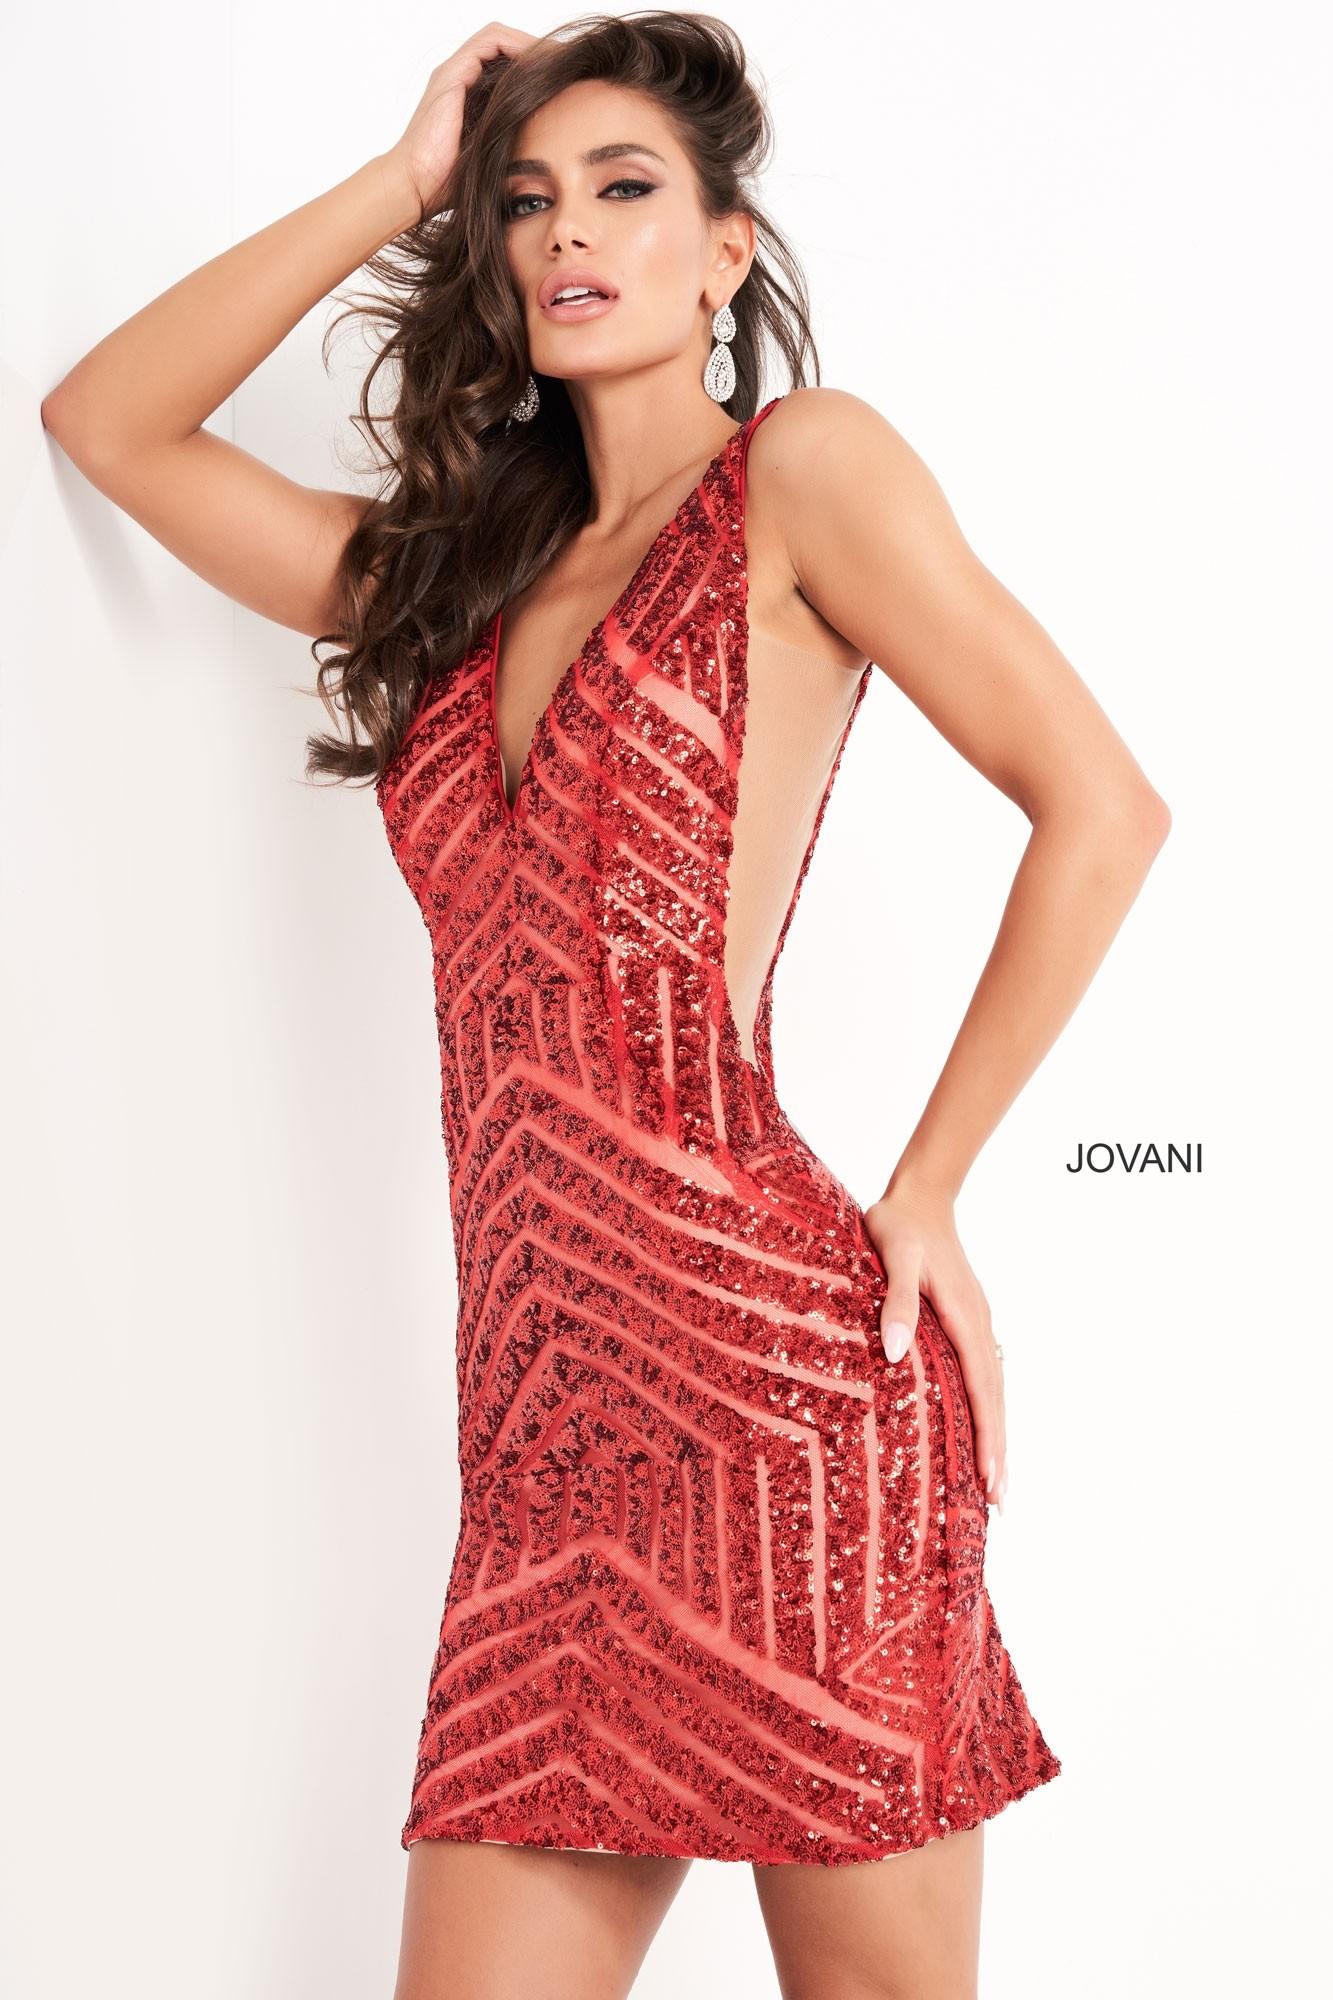 Jovani 63899